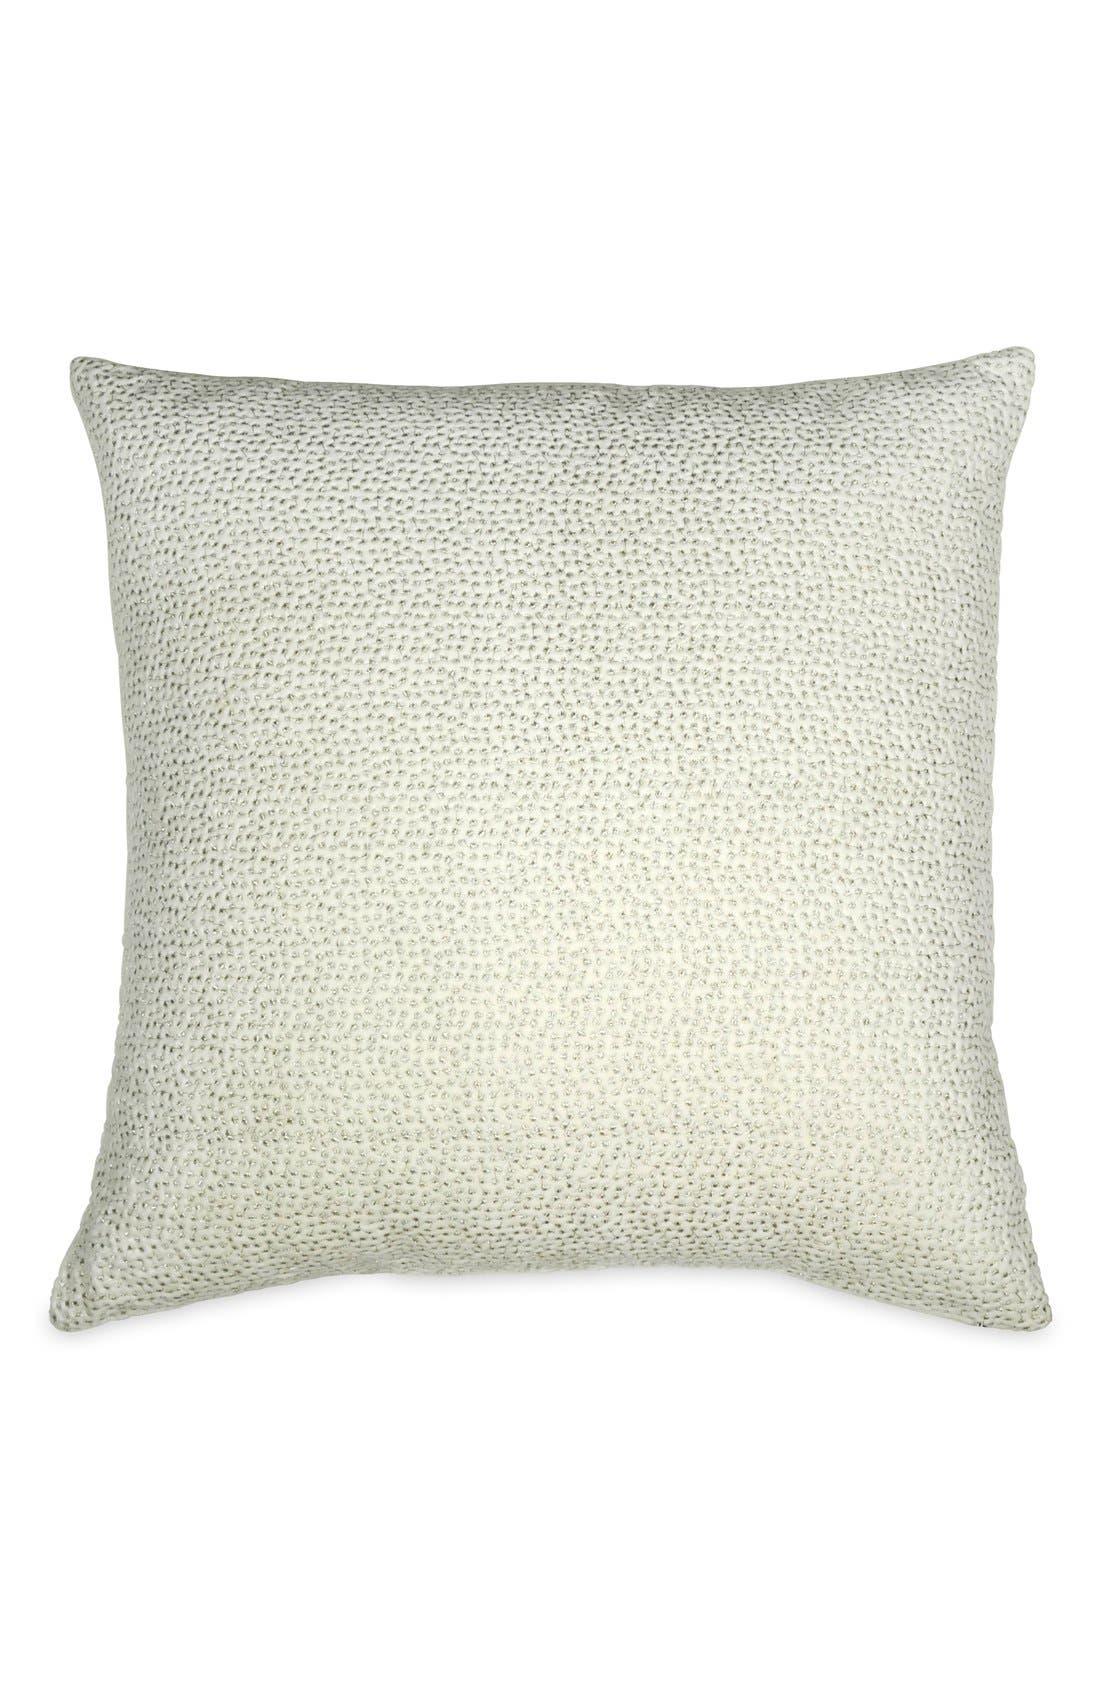 Donna Karan Collection 'Exhale' Pillow,                         Main,                         color,